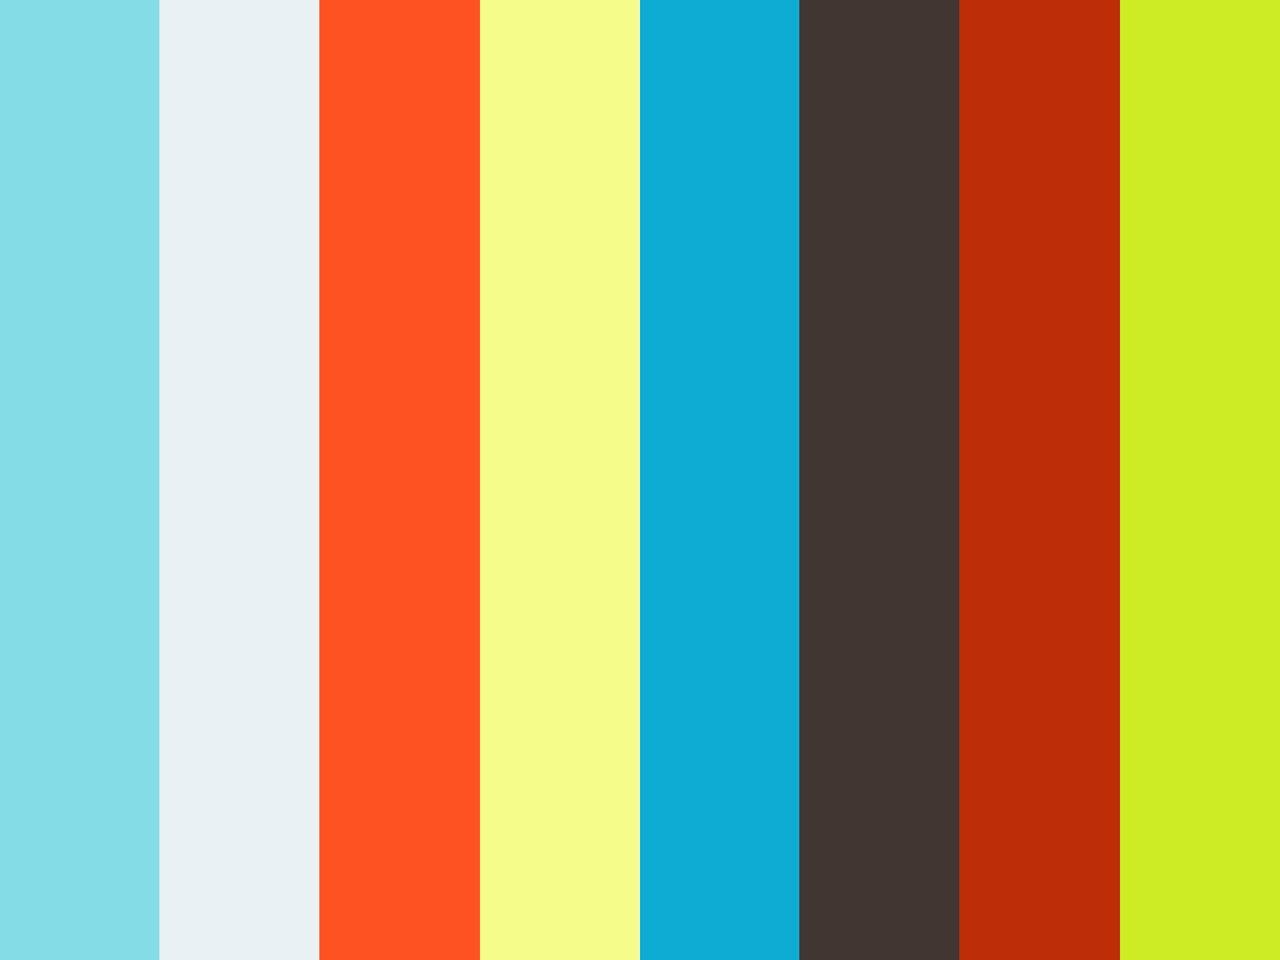 "NLM ""The Great Exhibition - Part 3"" Jon Scofield (03-17-2018)"